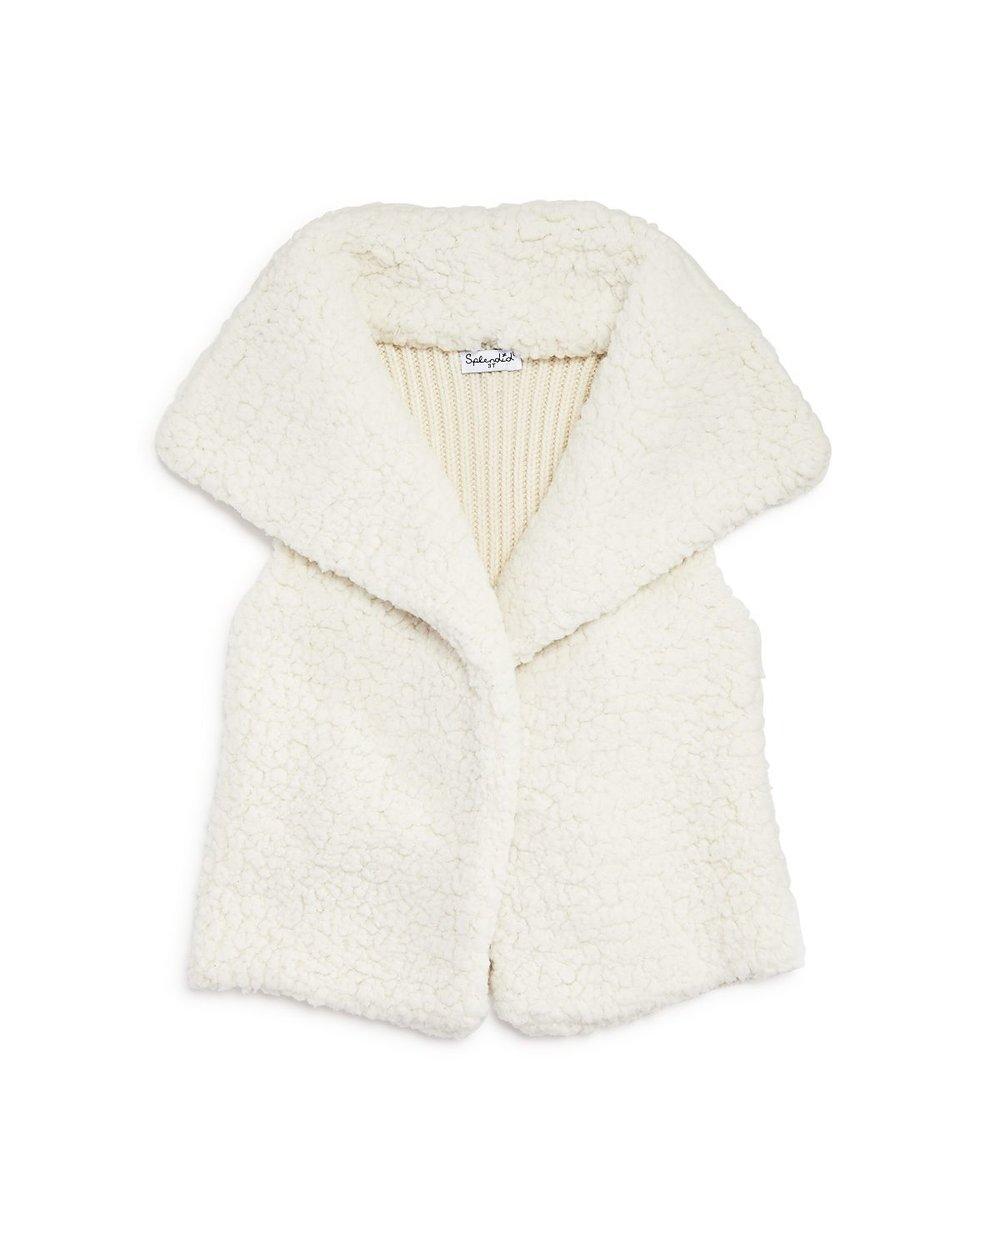 toddler sherpa vest.jpg